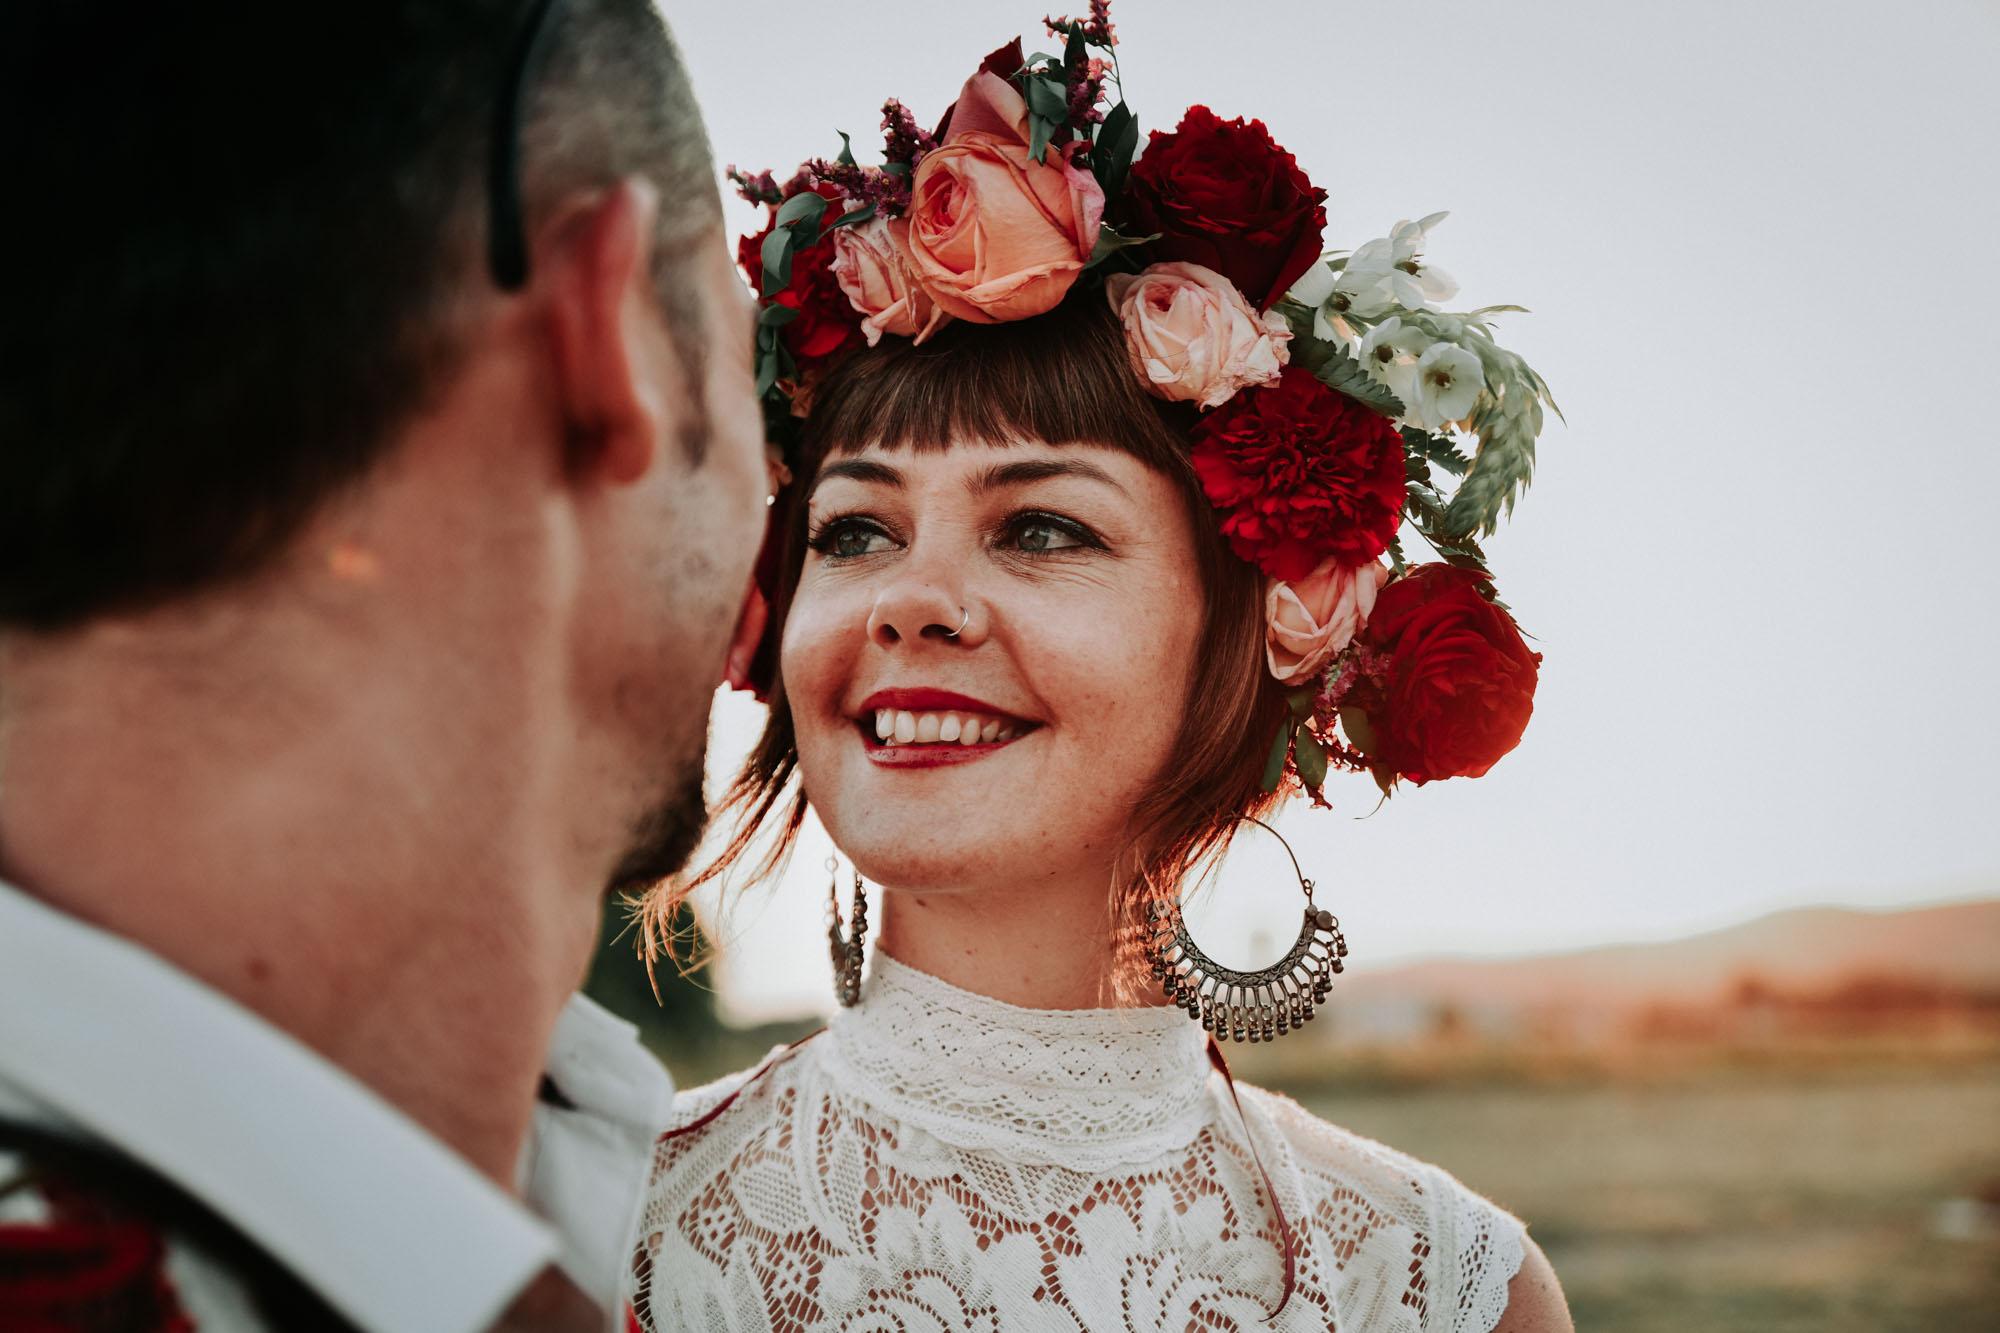 2018-08-04 - LD8_3167 - photographe mariage lyon - laurie diaz - www.lauriediazweeding.com.jpg